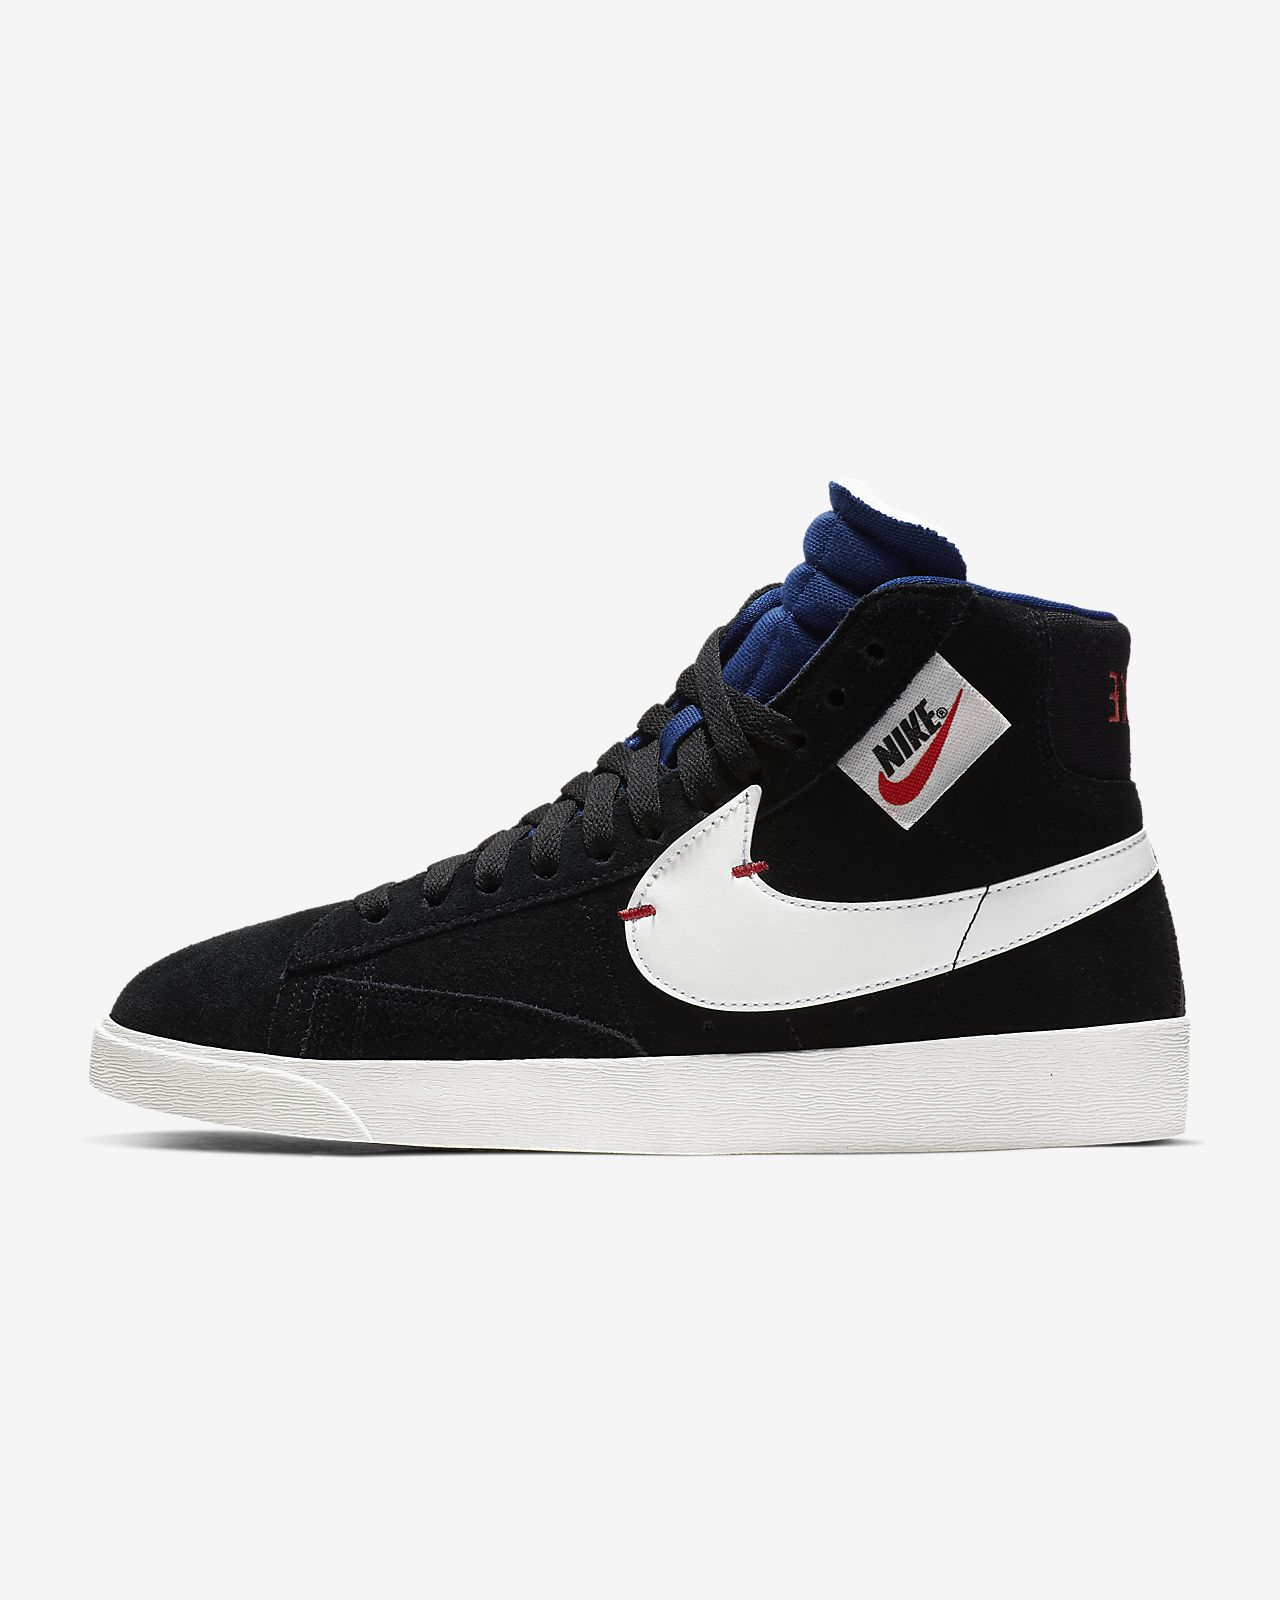 07c666b41a0 Nike Blazer Mid Rebel Women s Shoe. Nike.com SG